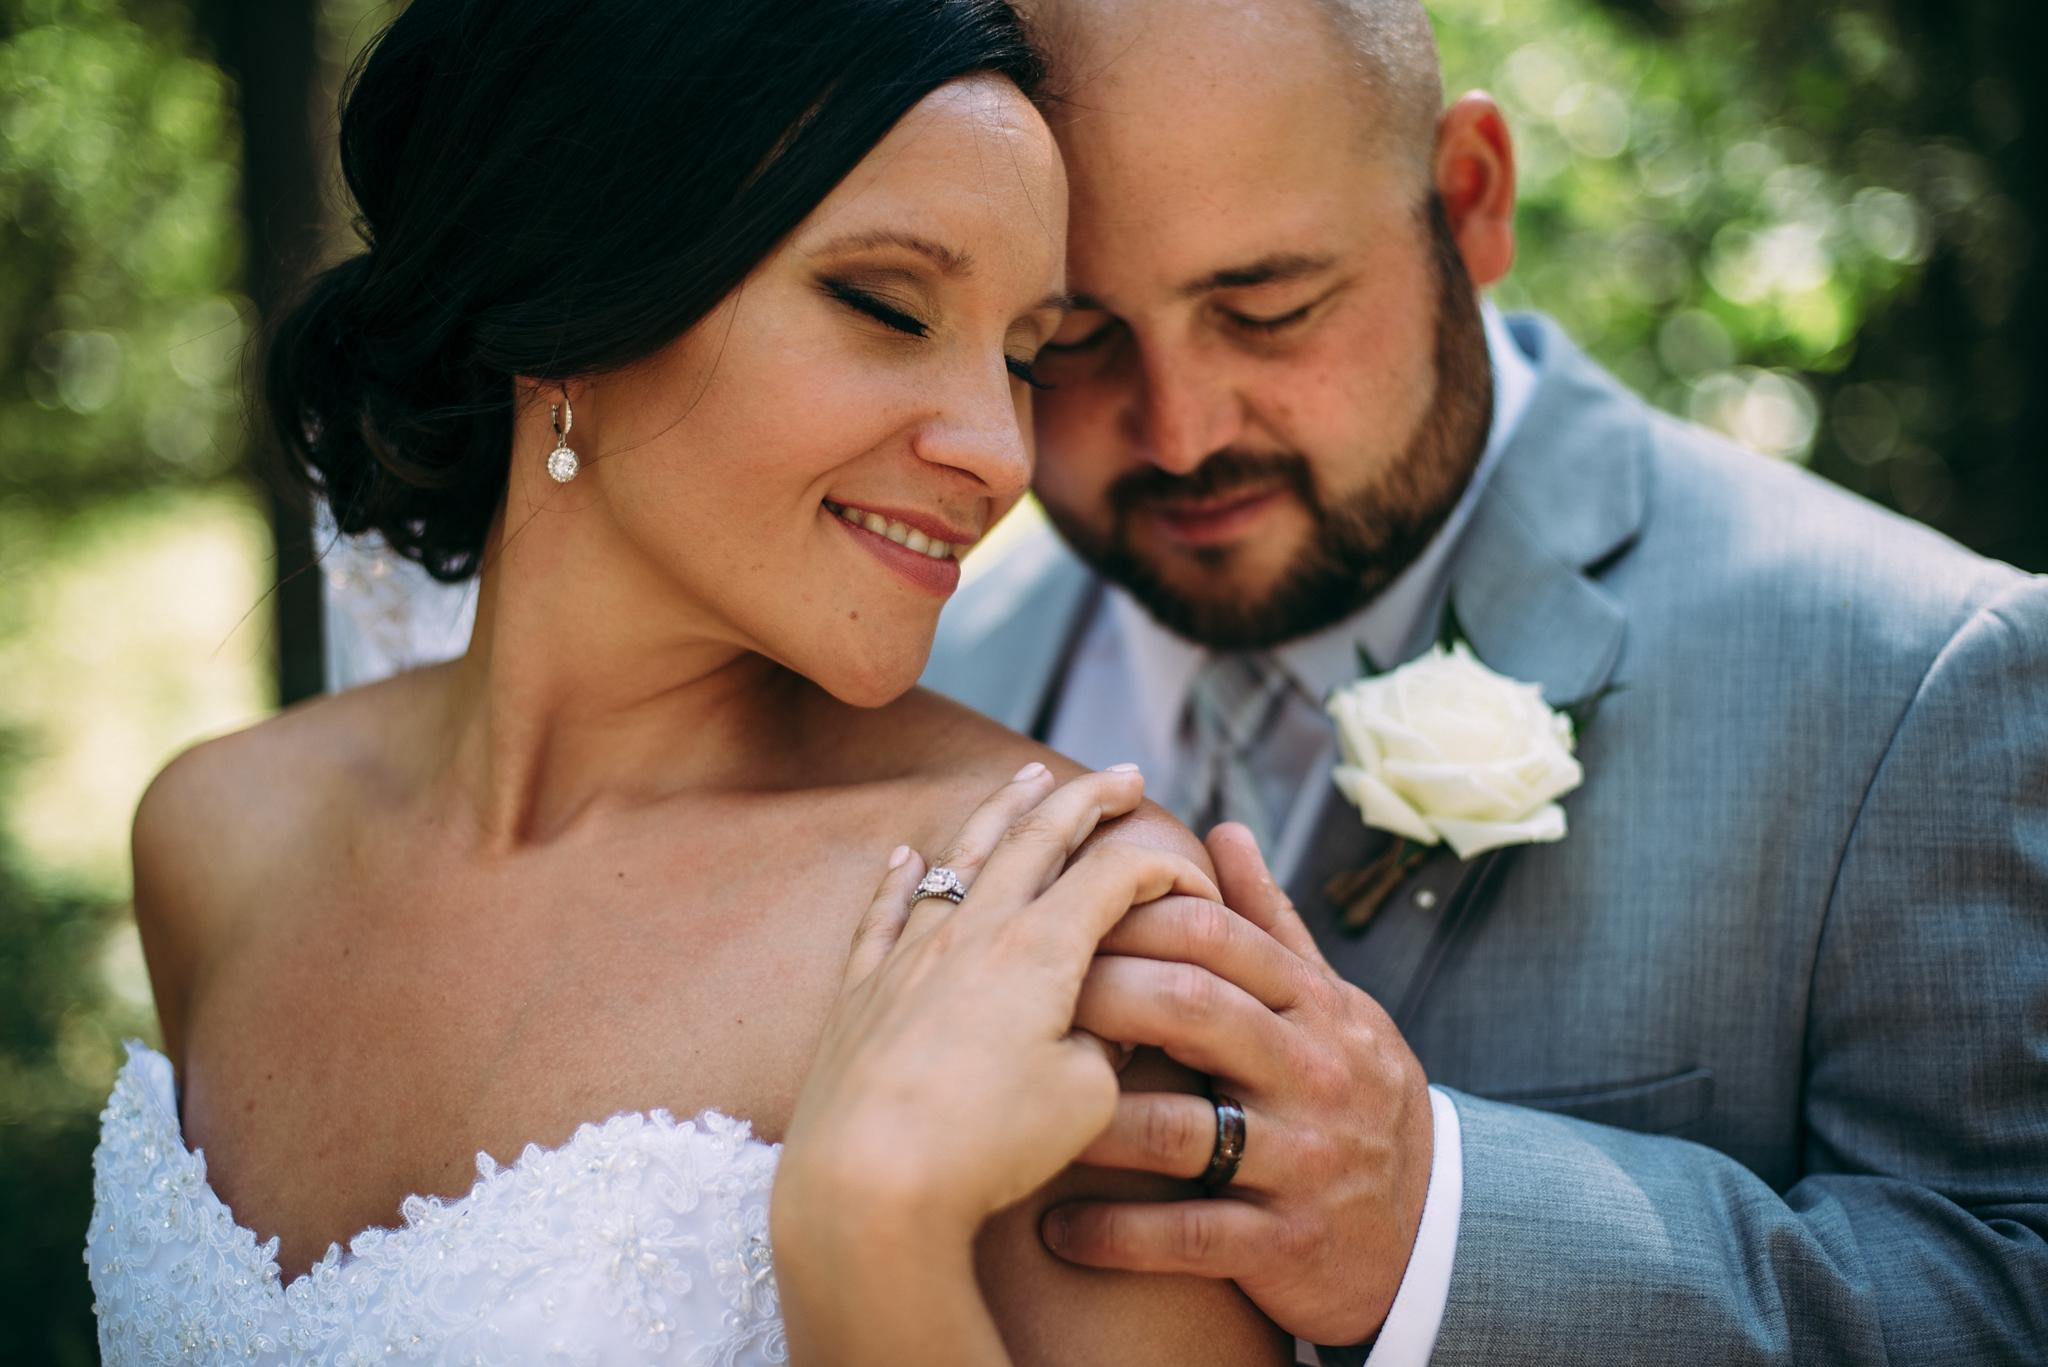 kaihla_tonai_intimate_wedding_elopement_photographer_1539